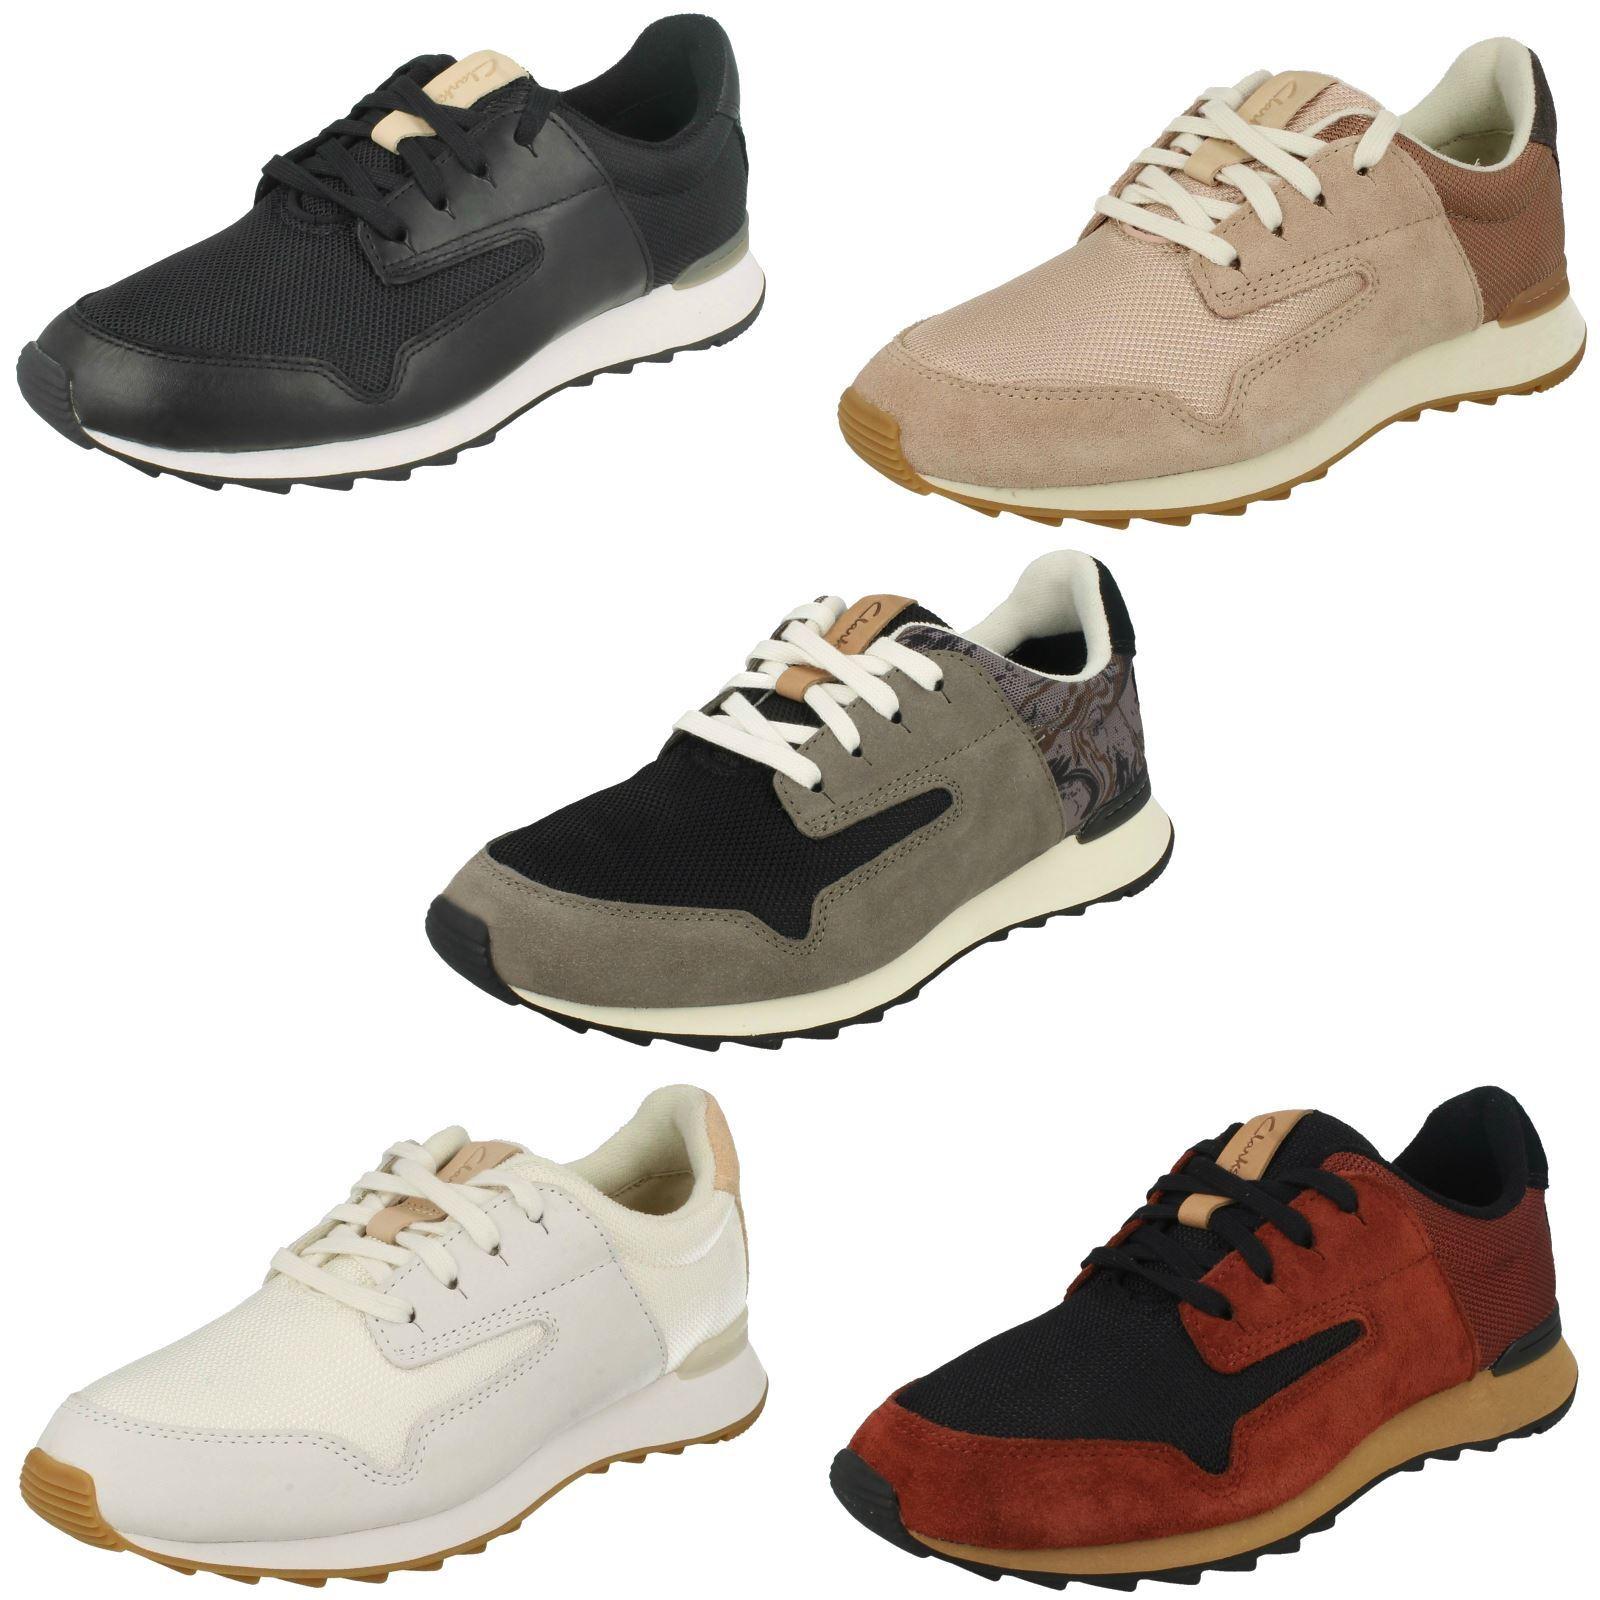 Venta de liquidación de temporada Clarks Zapatos Estilo entrenador señoras-floura Mix